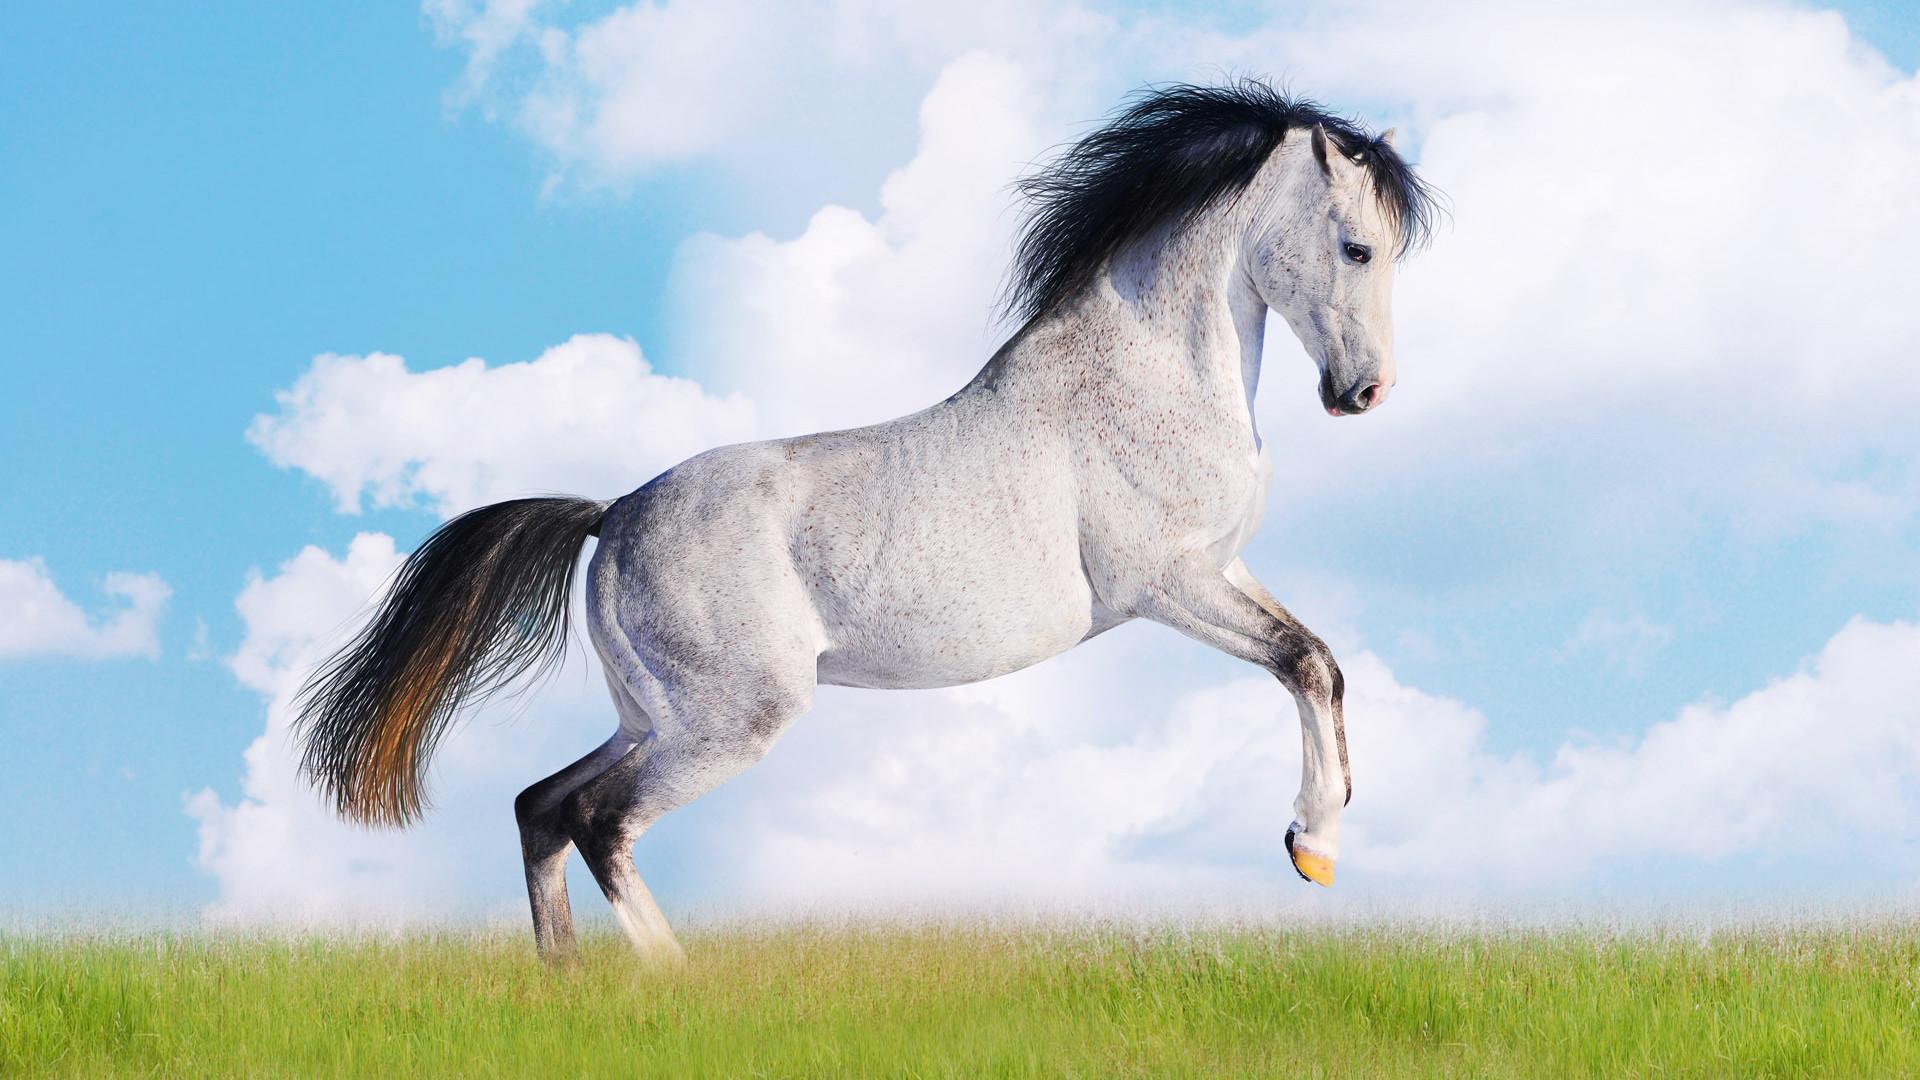 Beautiful Animal HD images